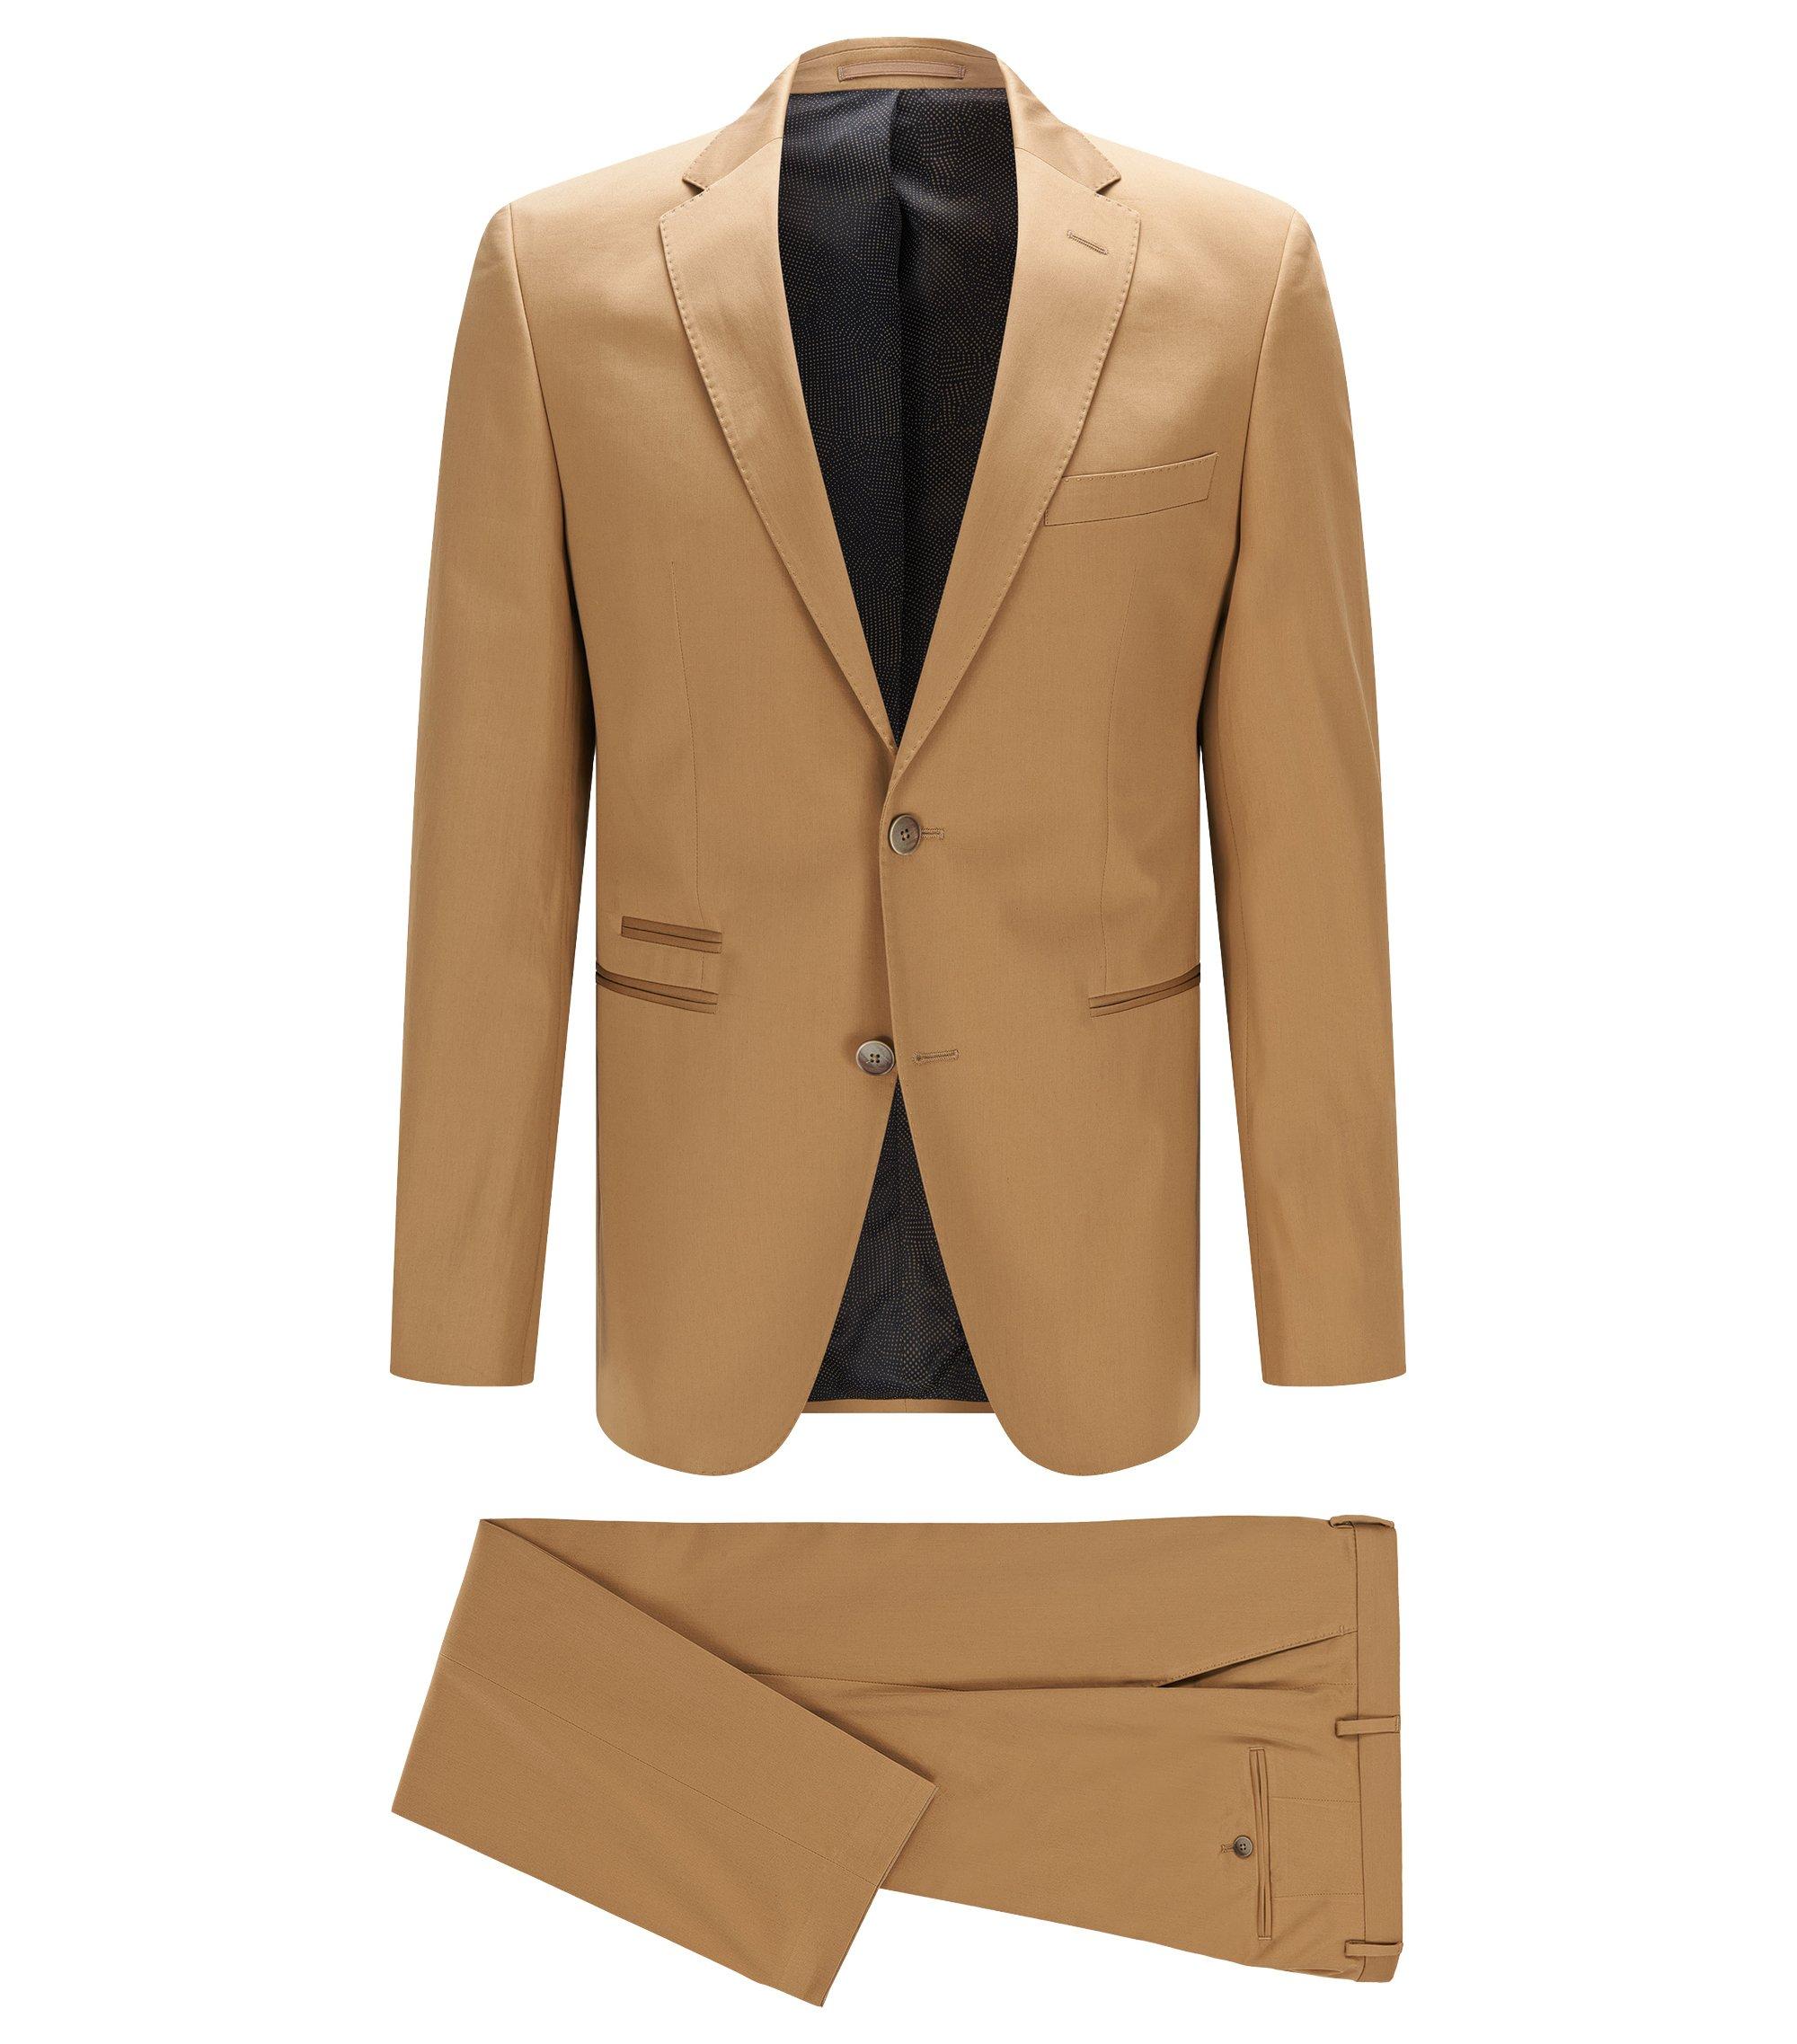 Stretch Pima Cotton Suit, Regular Fit | Jilman/Leran, Beige